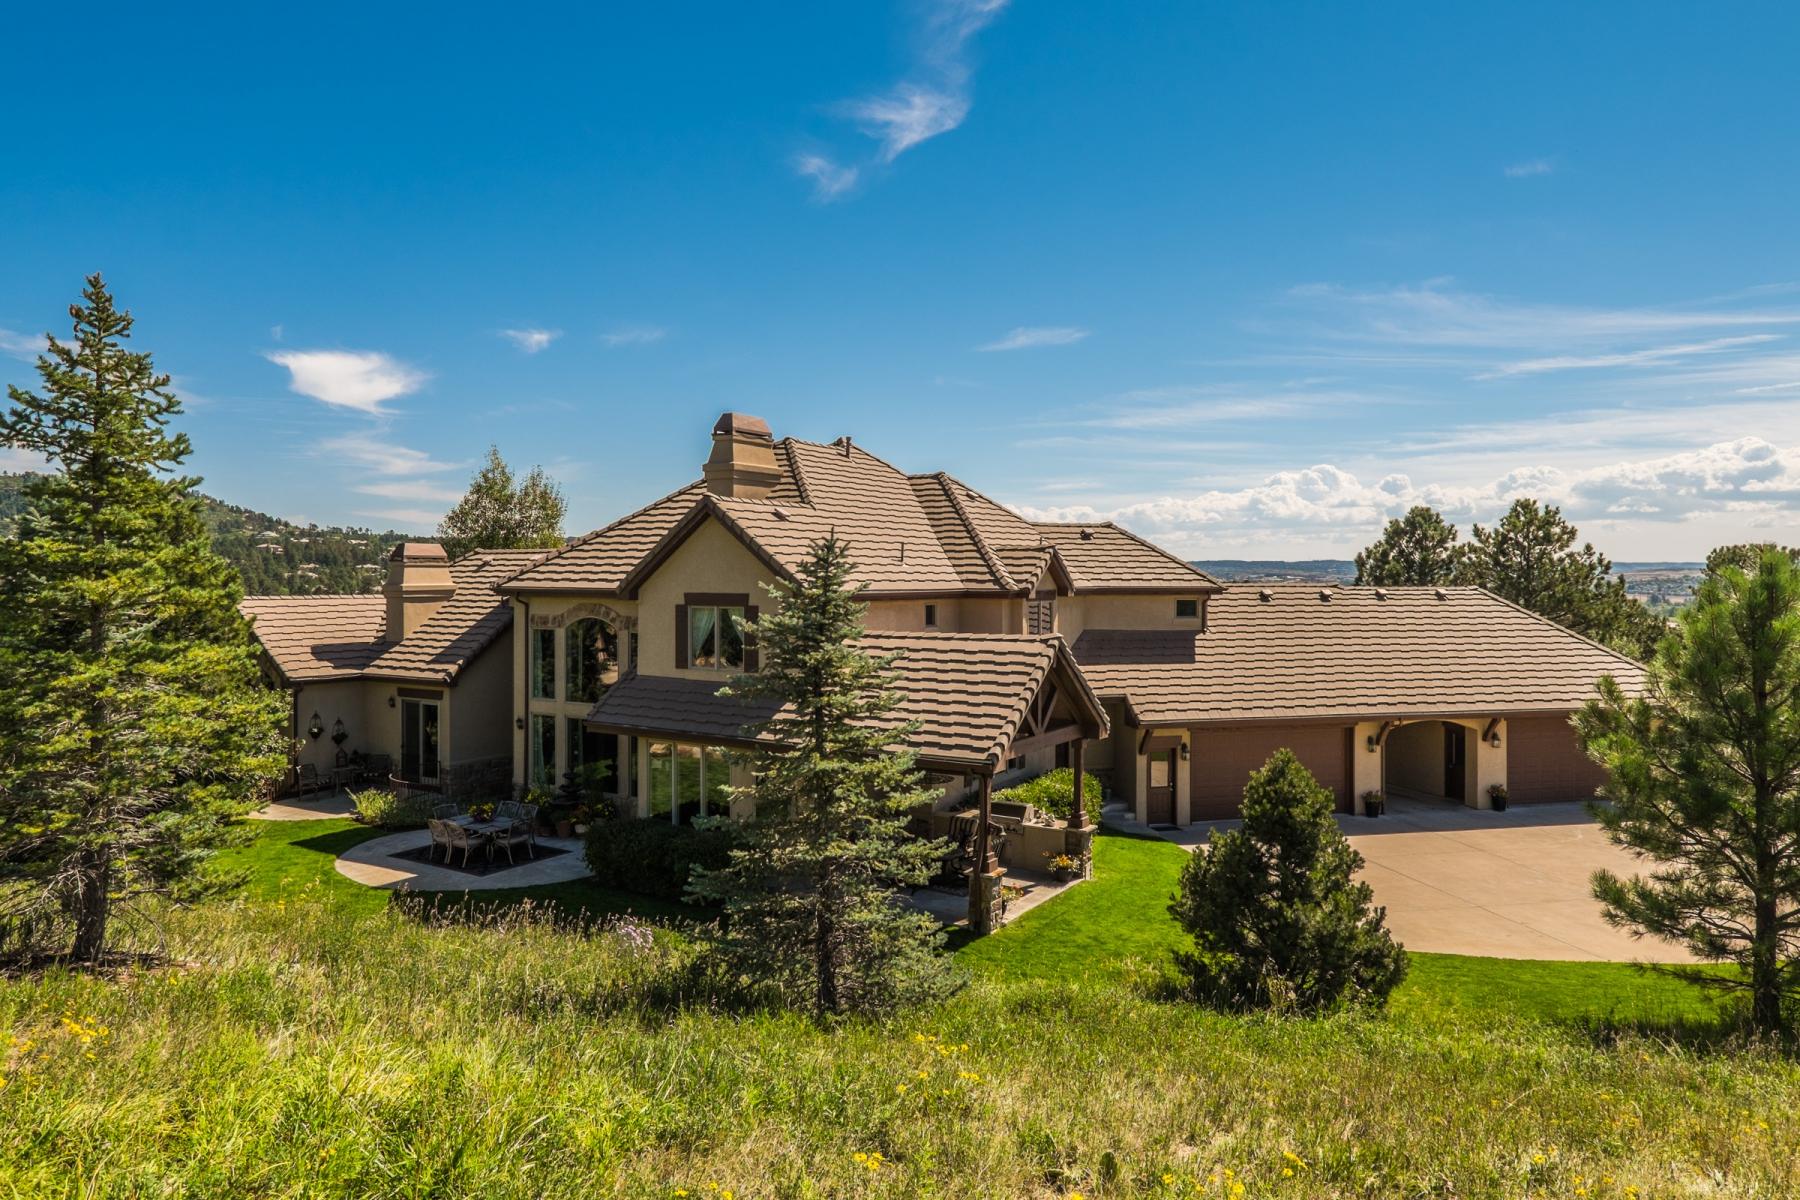 Single Family Home for Active at 1667 Macom Drive Sedalia, Colorado 80135 United States